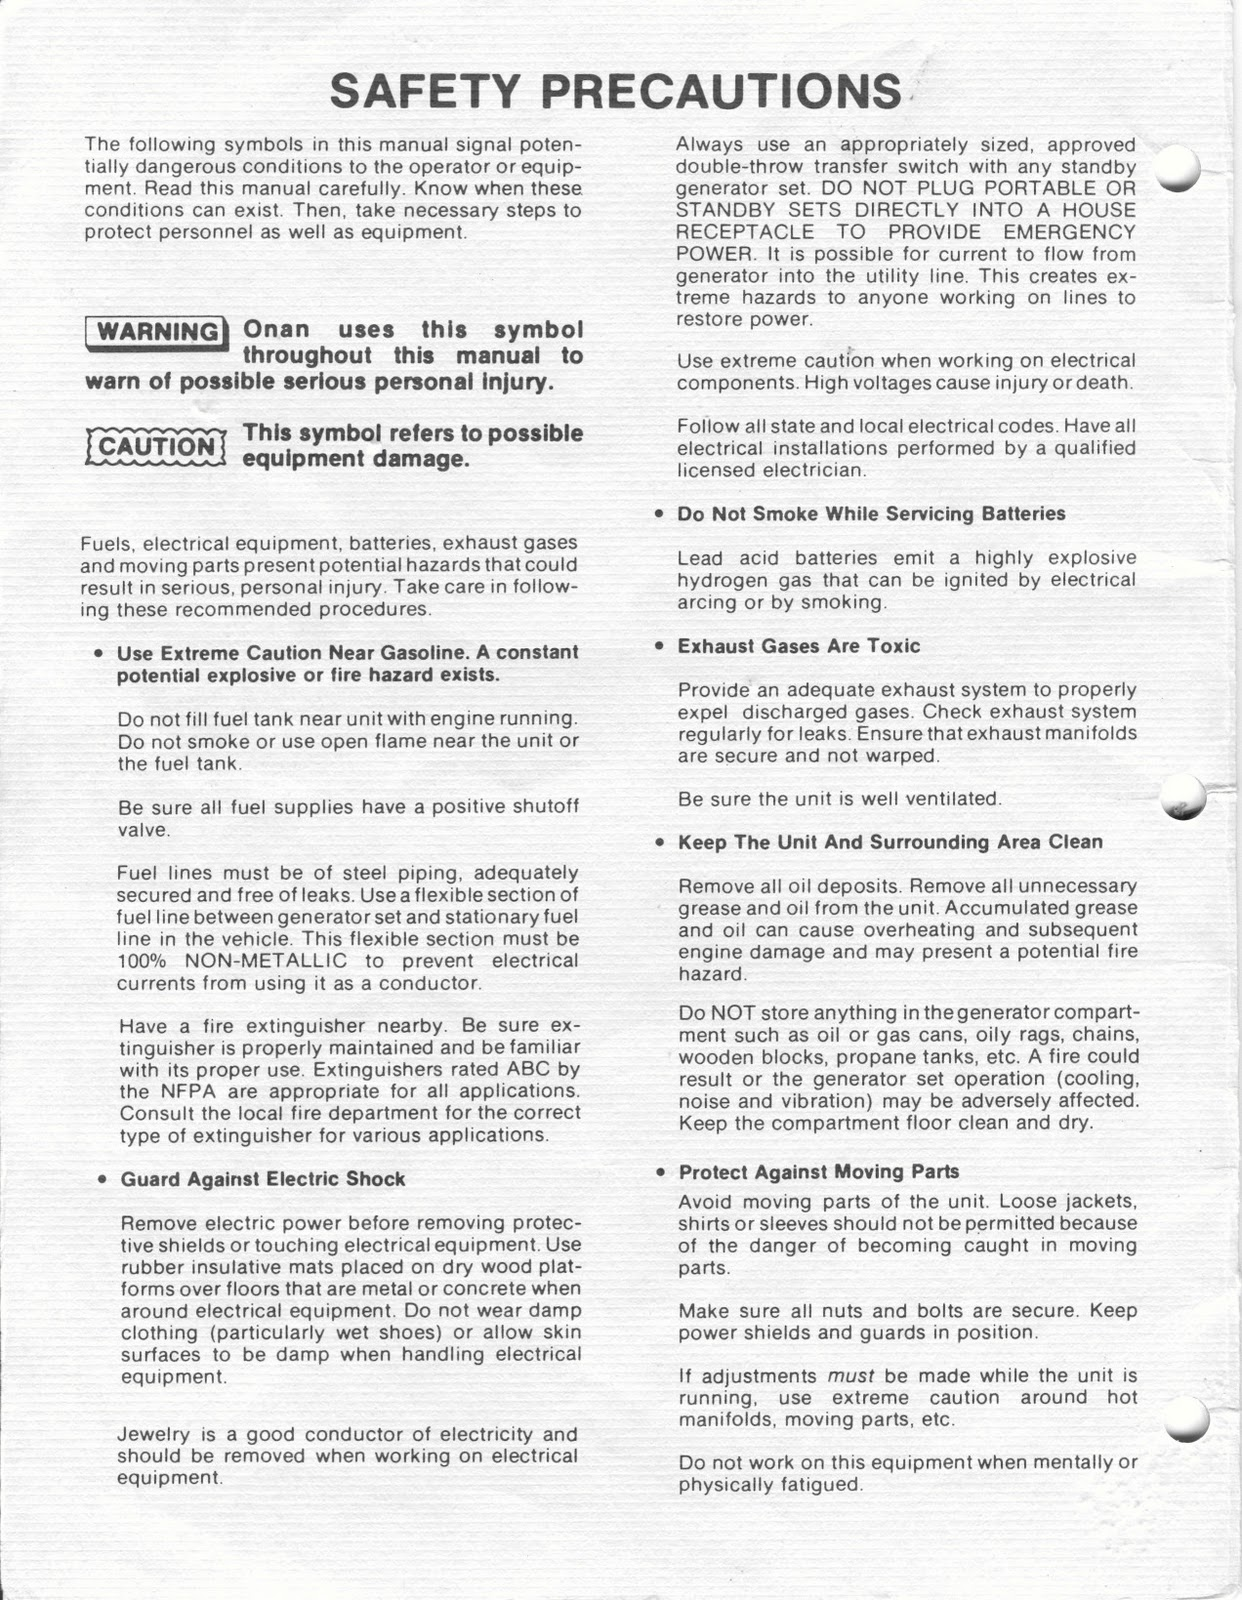 medium resolution of wiring diagram onan generator wiring image 1983 fleetwood pace arrow owners manuals onan 4 0 kw